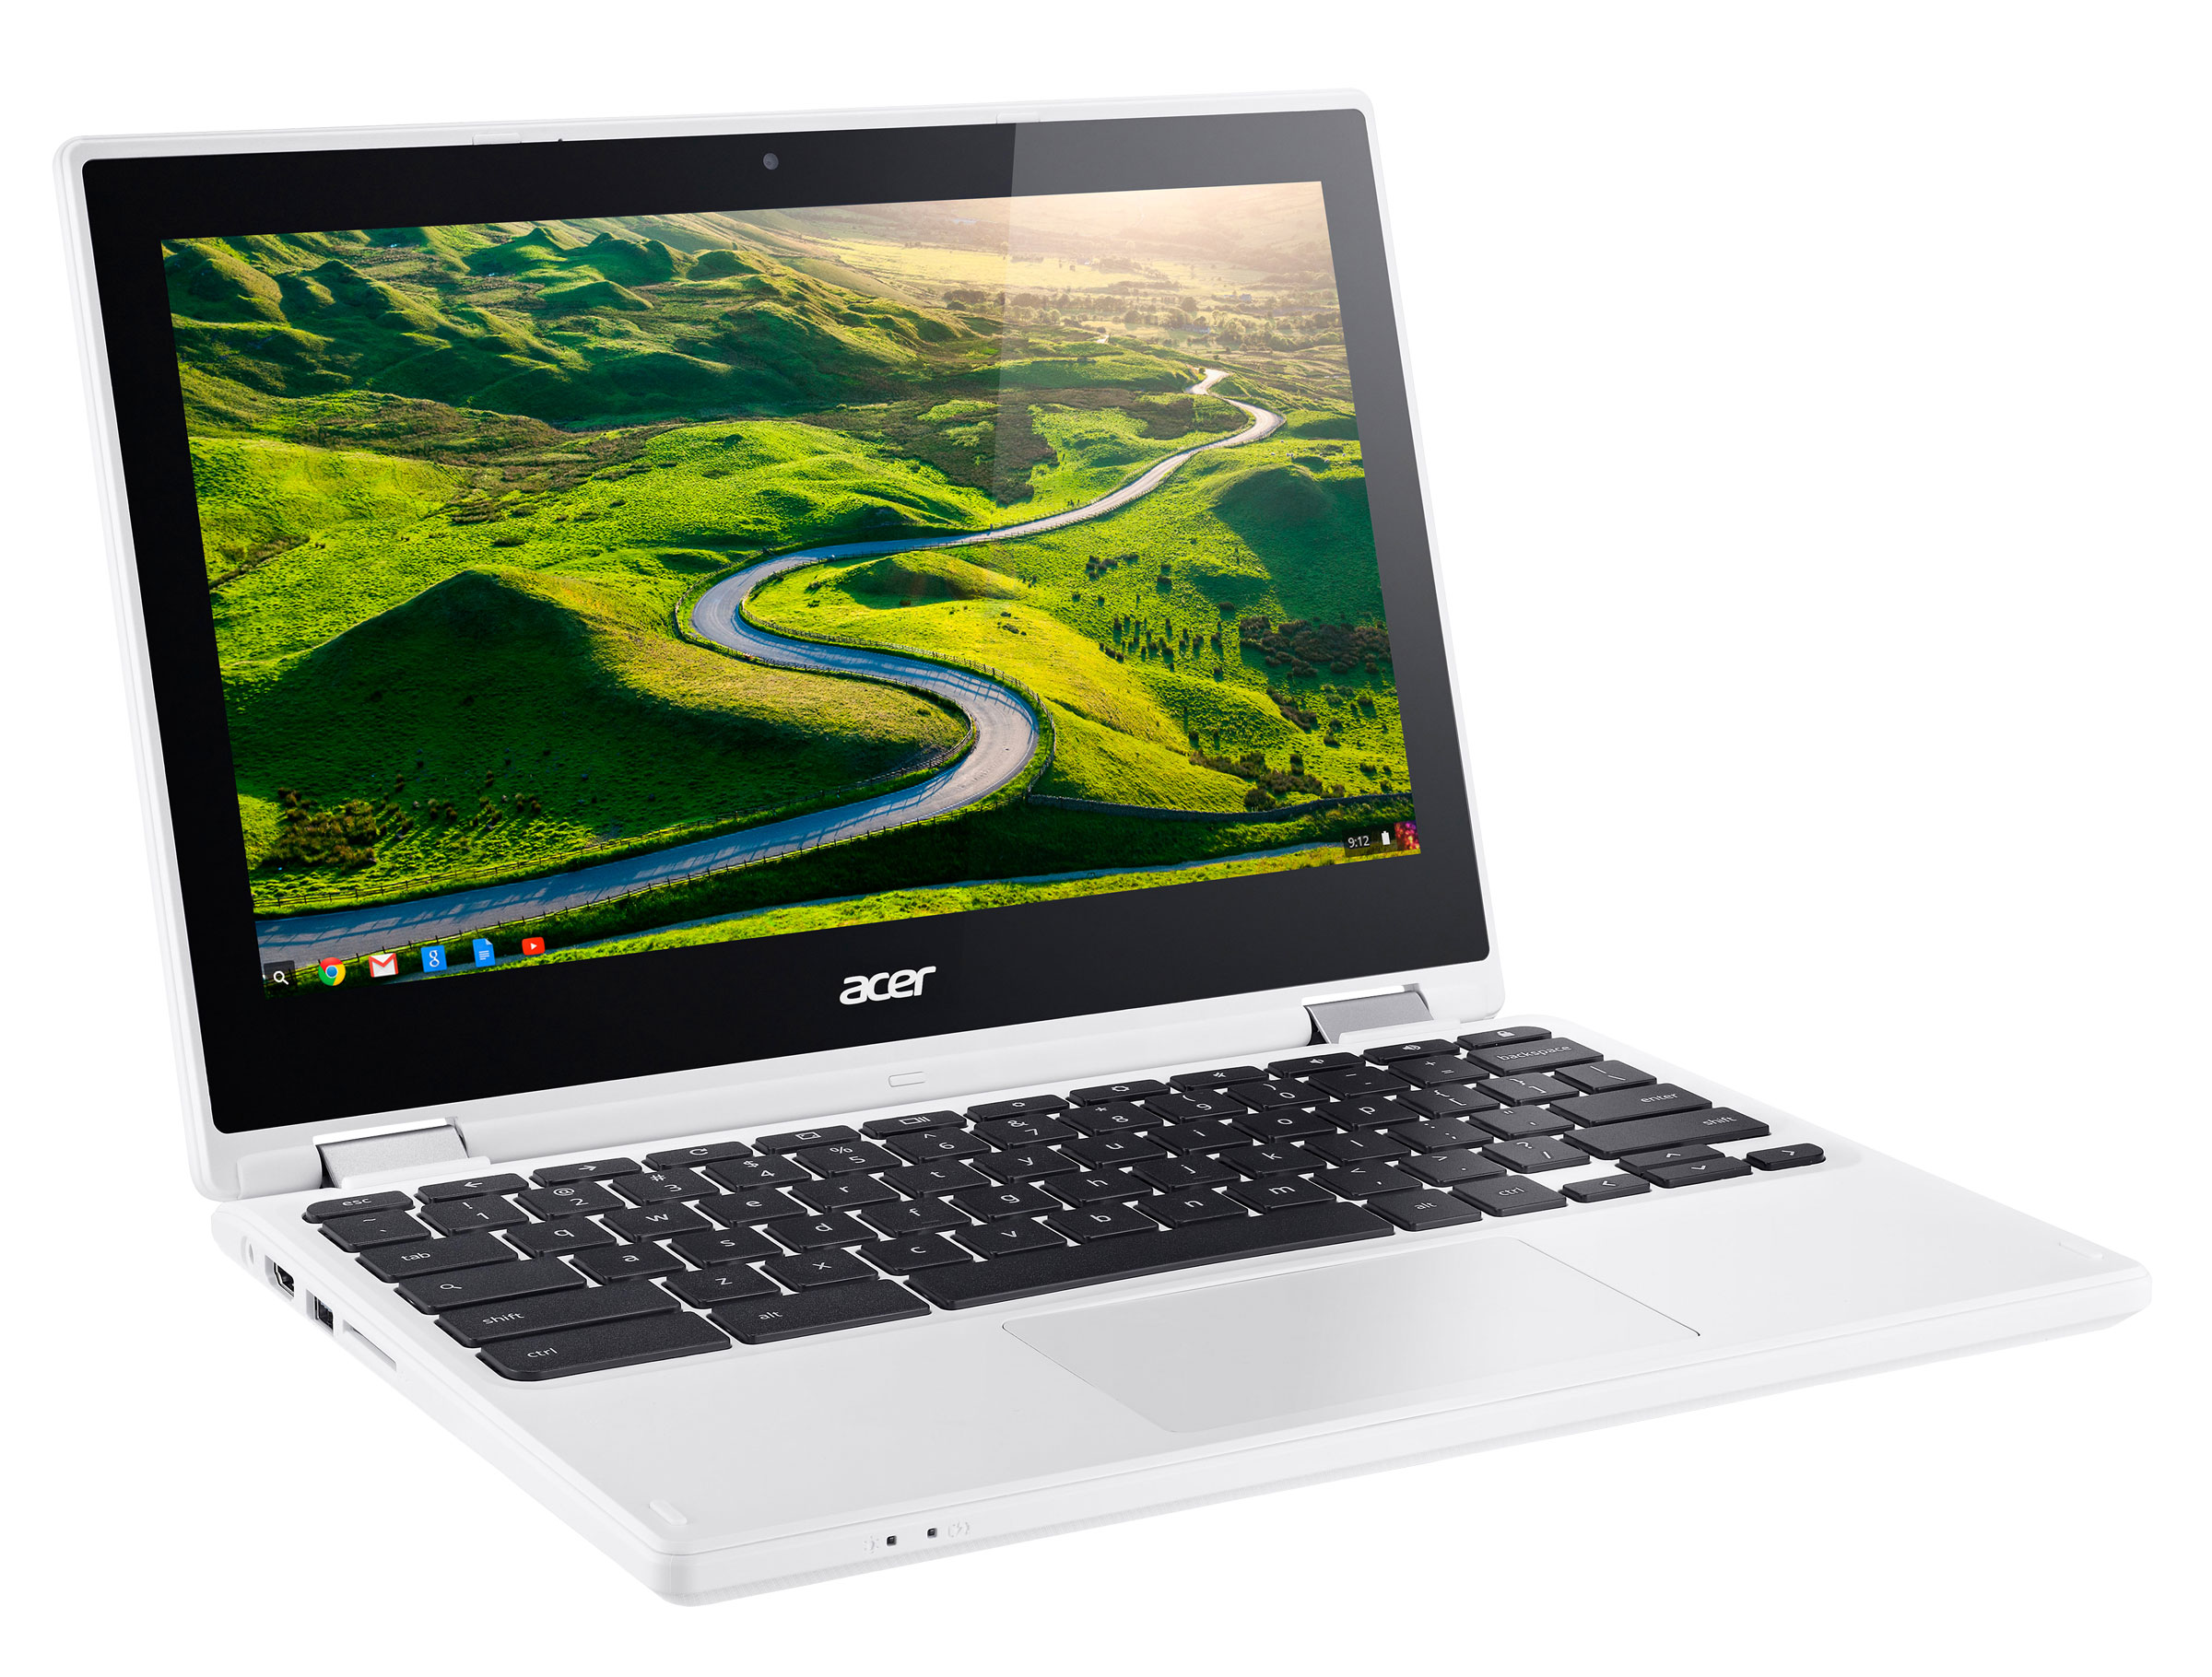 Acer R 11 CB5-132T-C9UM Intel Celeron 32GB SSD 2GB RAM 116 Convertible Chromebook